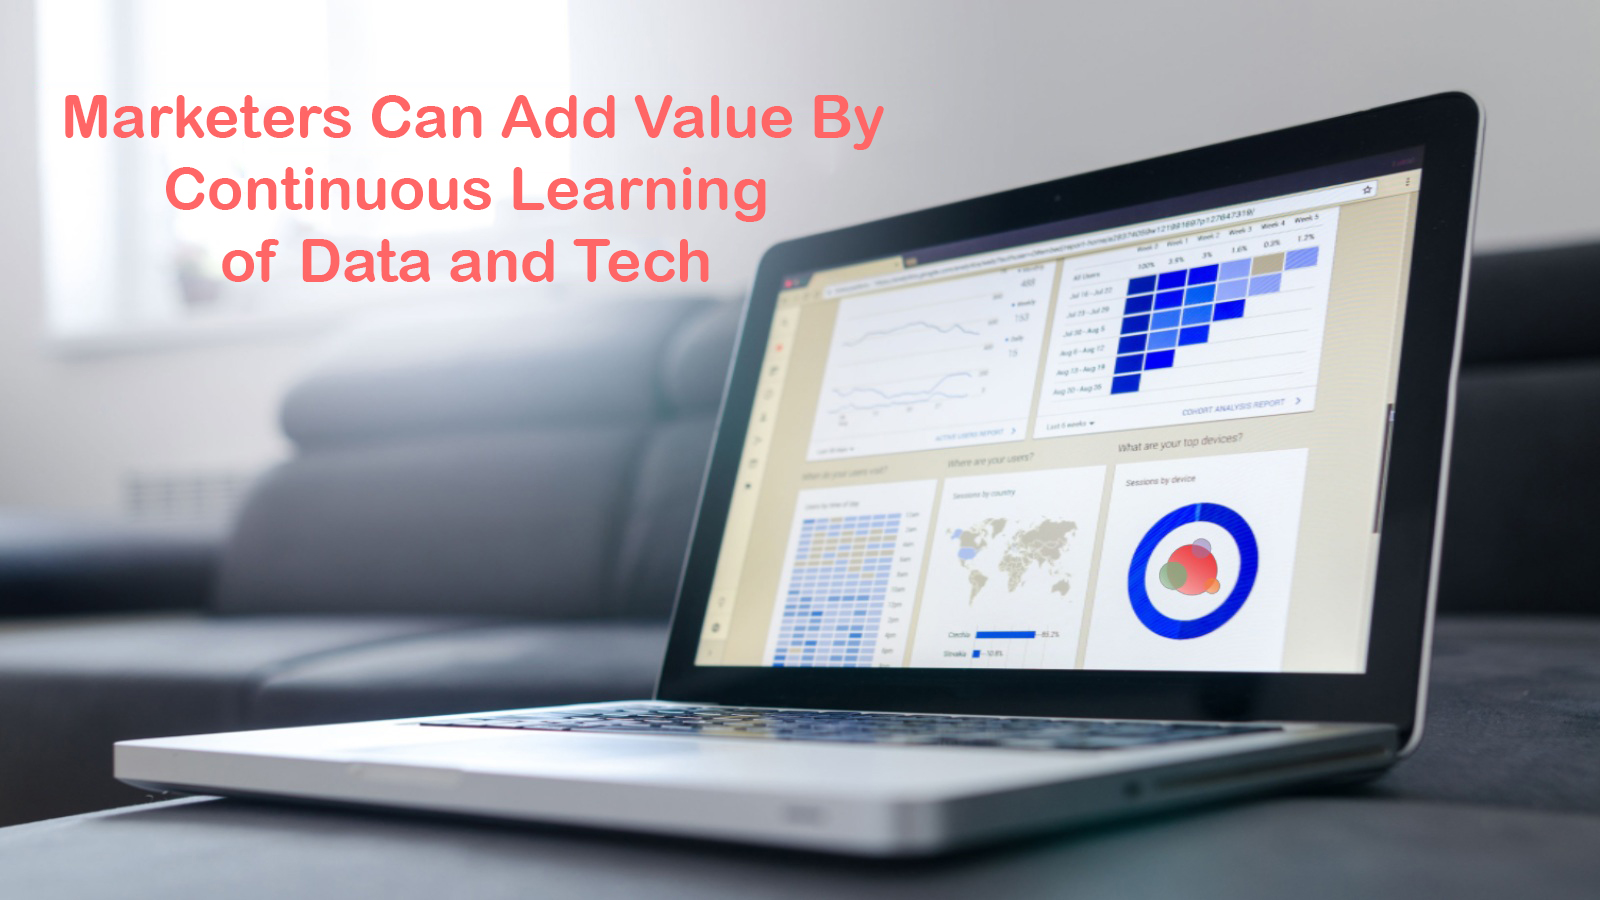 Six Ways Digital Marketers Can Instill Lifelong Learning